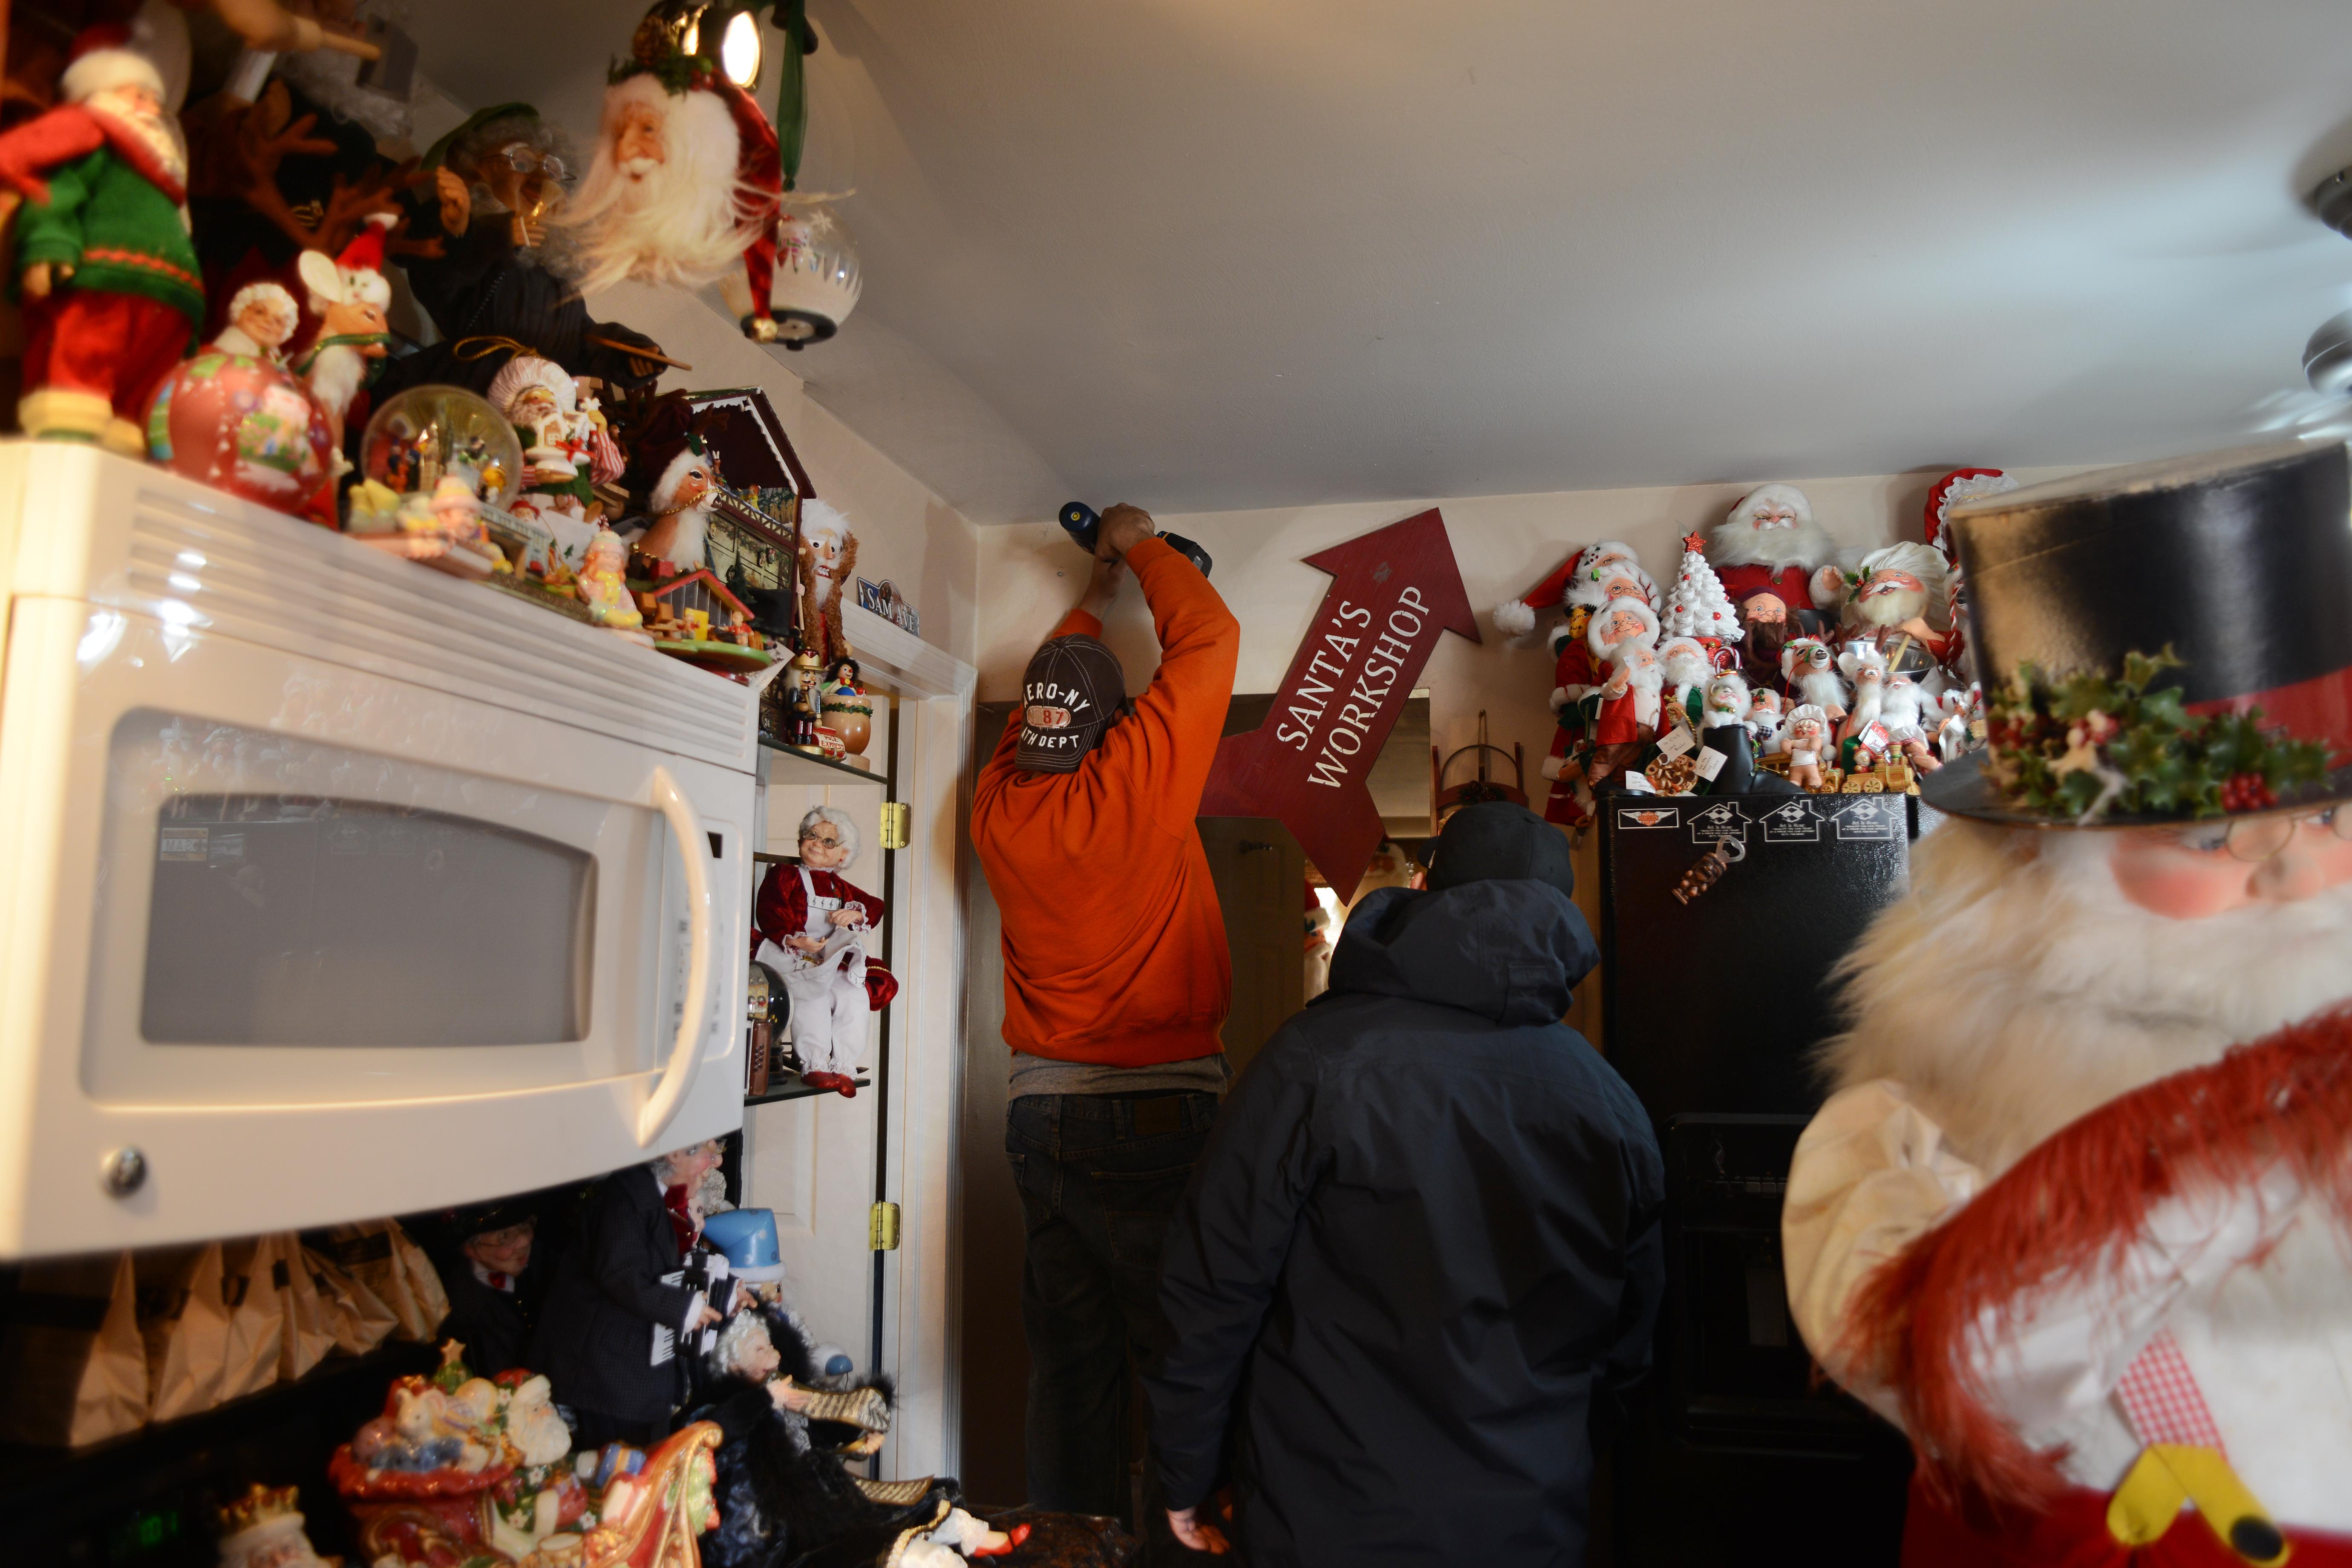 Ray helps Sammy install Christmas decorations.